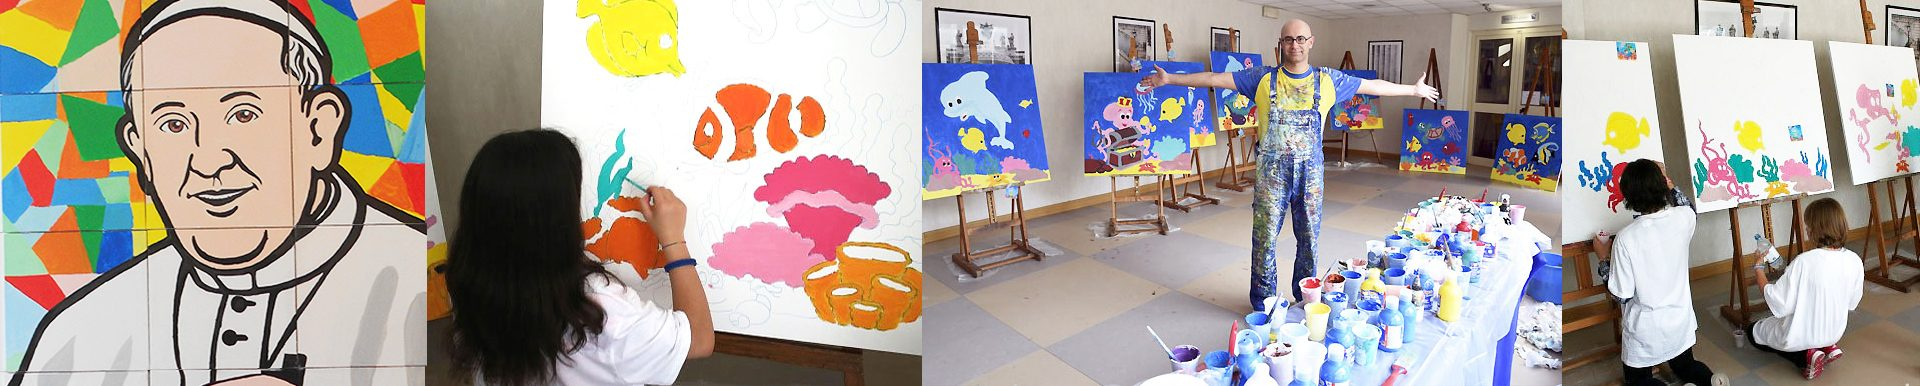 murales_frizzi_bambini_ospedale5